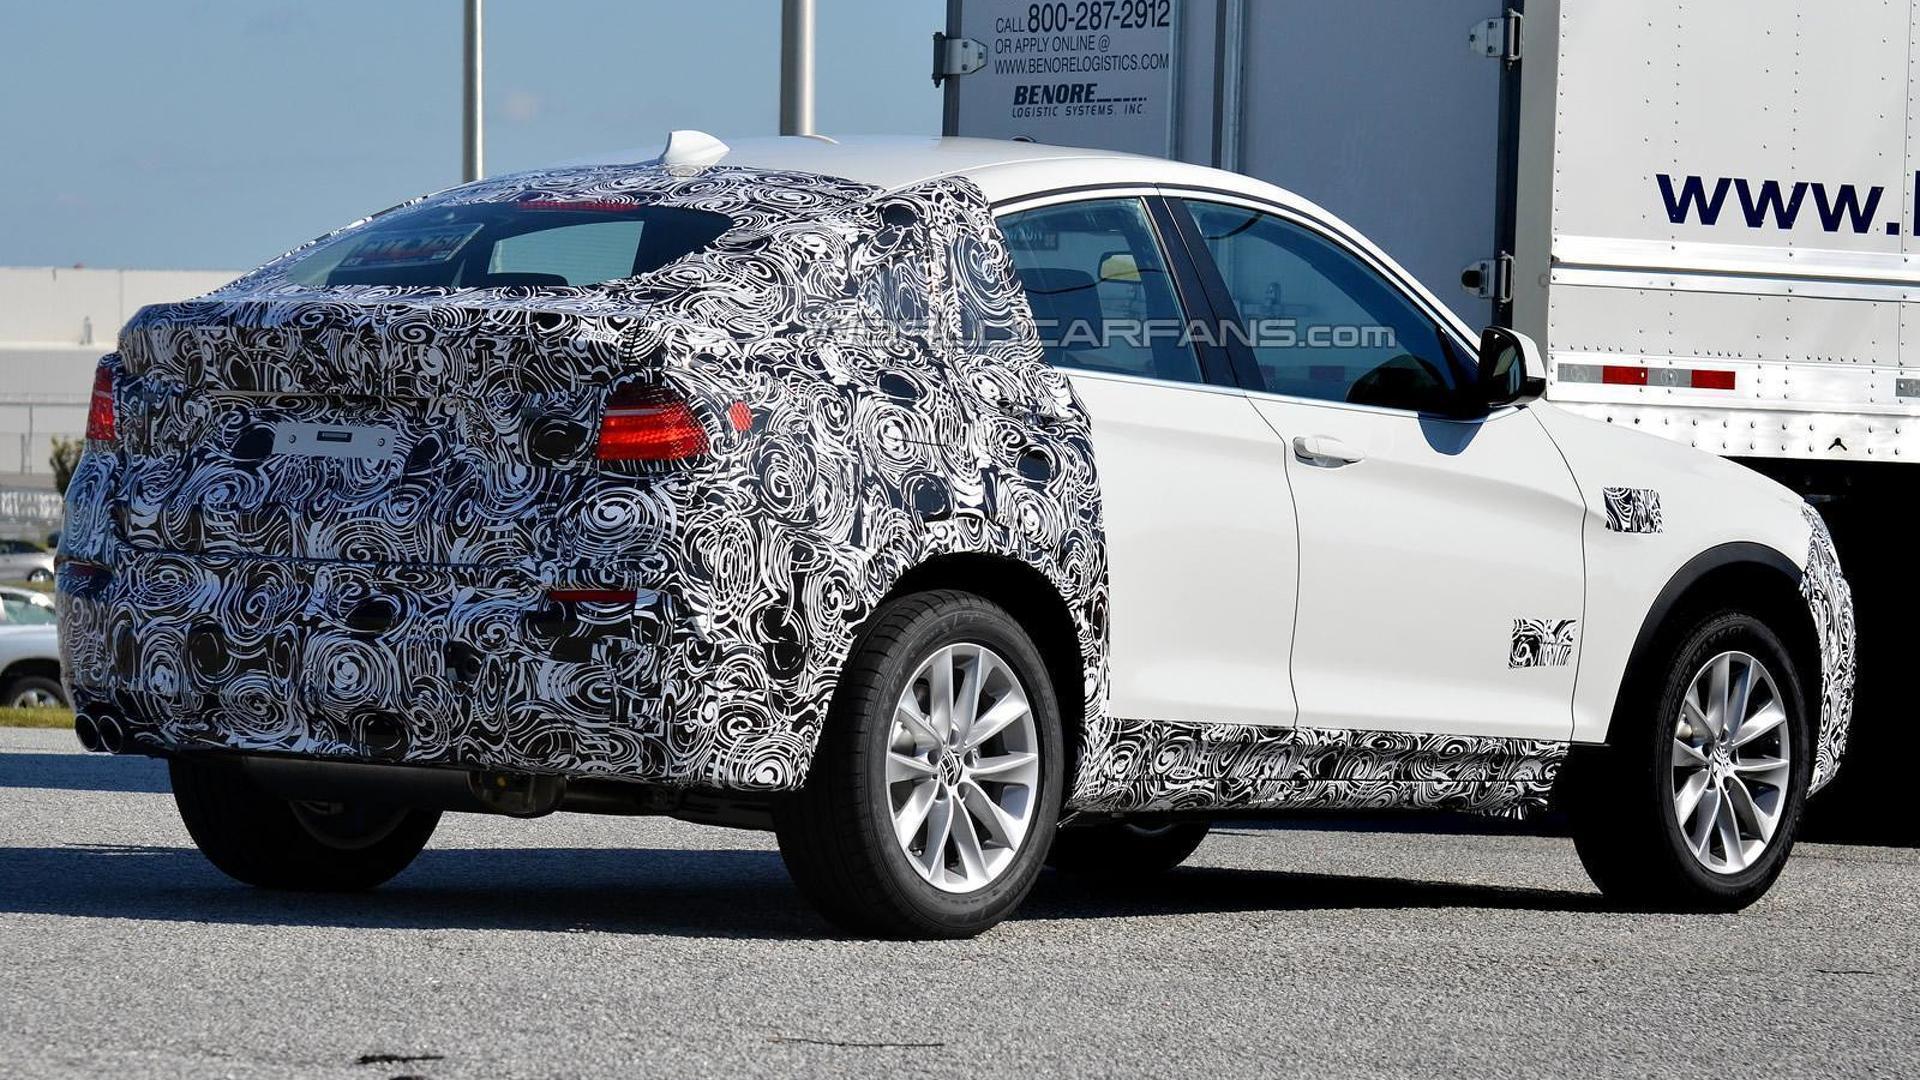 2014 BMW X4 returns to the Nurburgring [video]